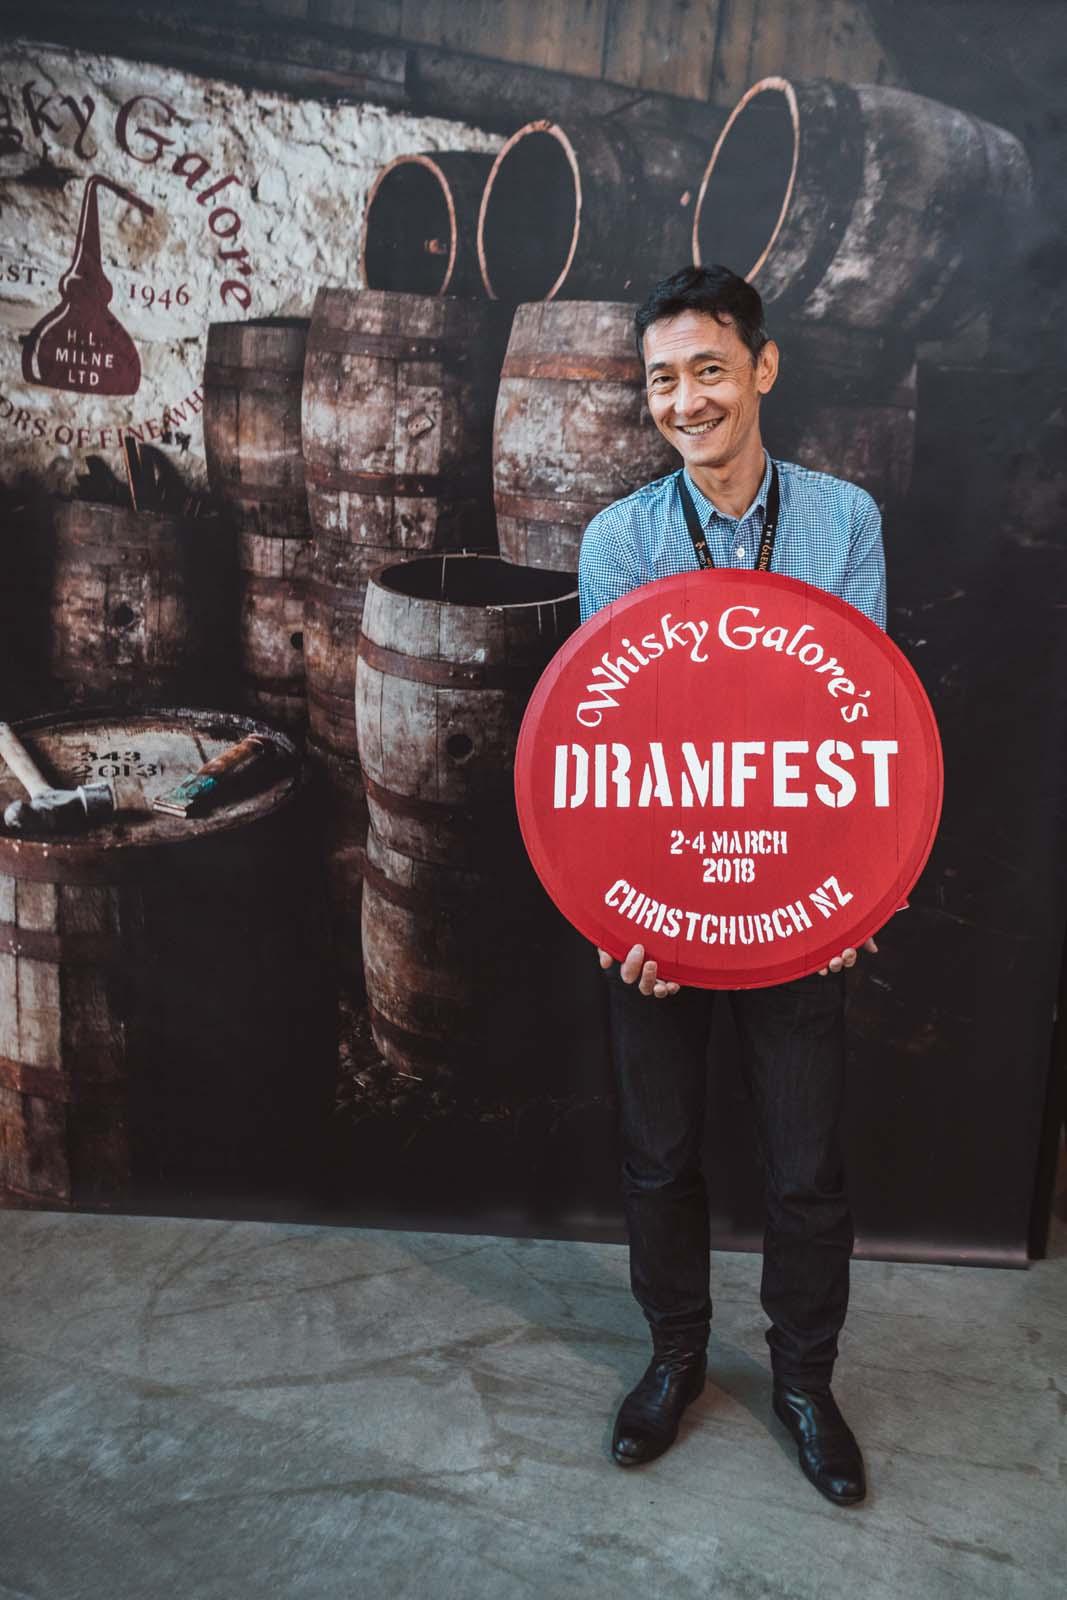 Dramfest 2018 for Whisky Galore-131.jpg